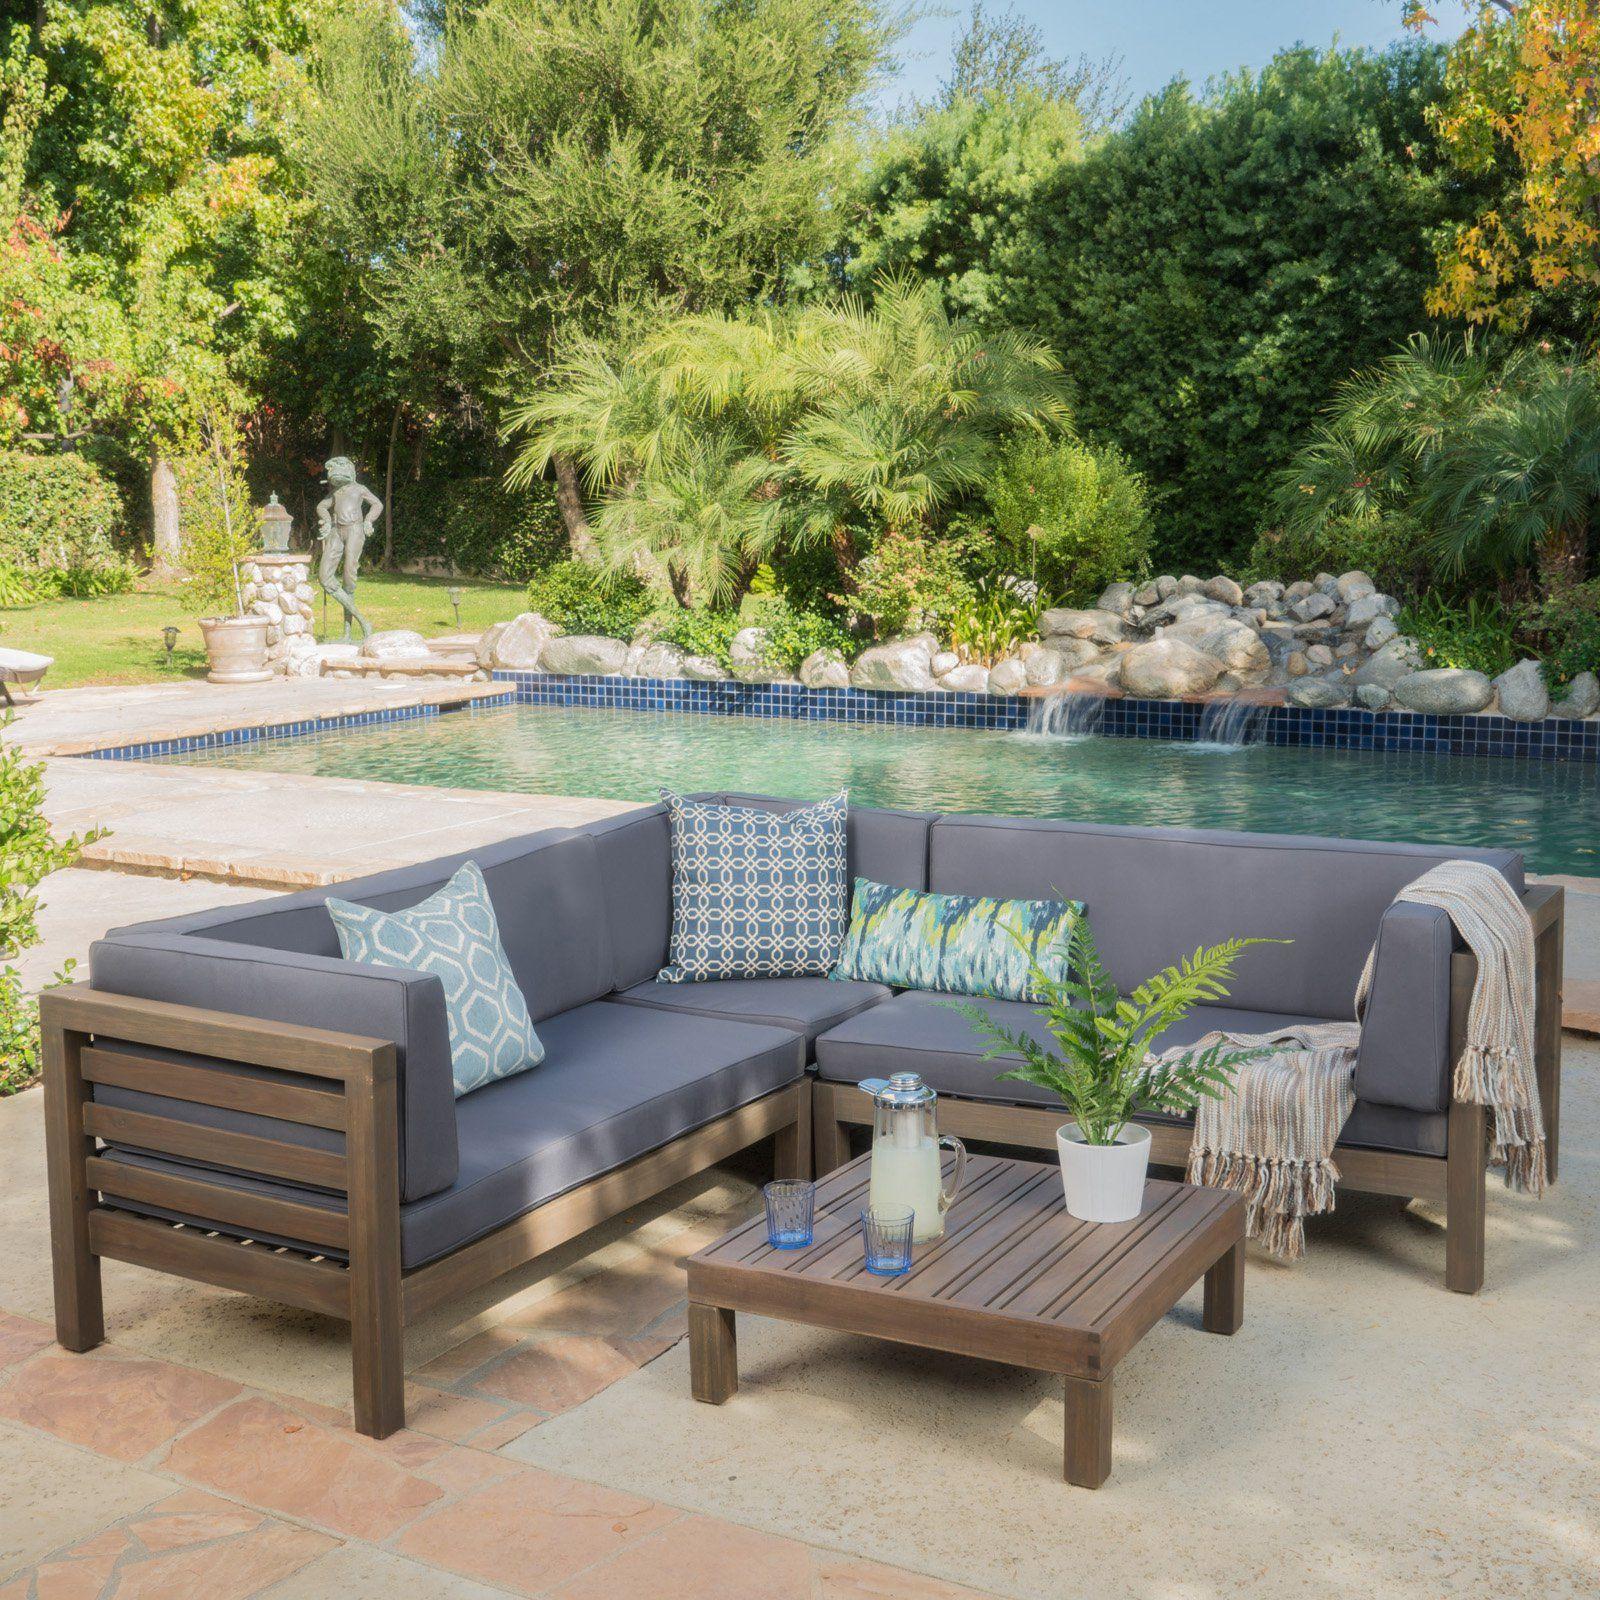 Patio Room Furniture: Outdoor Oana Wooden 4 Piece Patio Sectional Sofa Set Dark